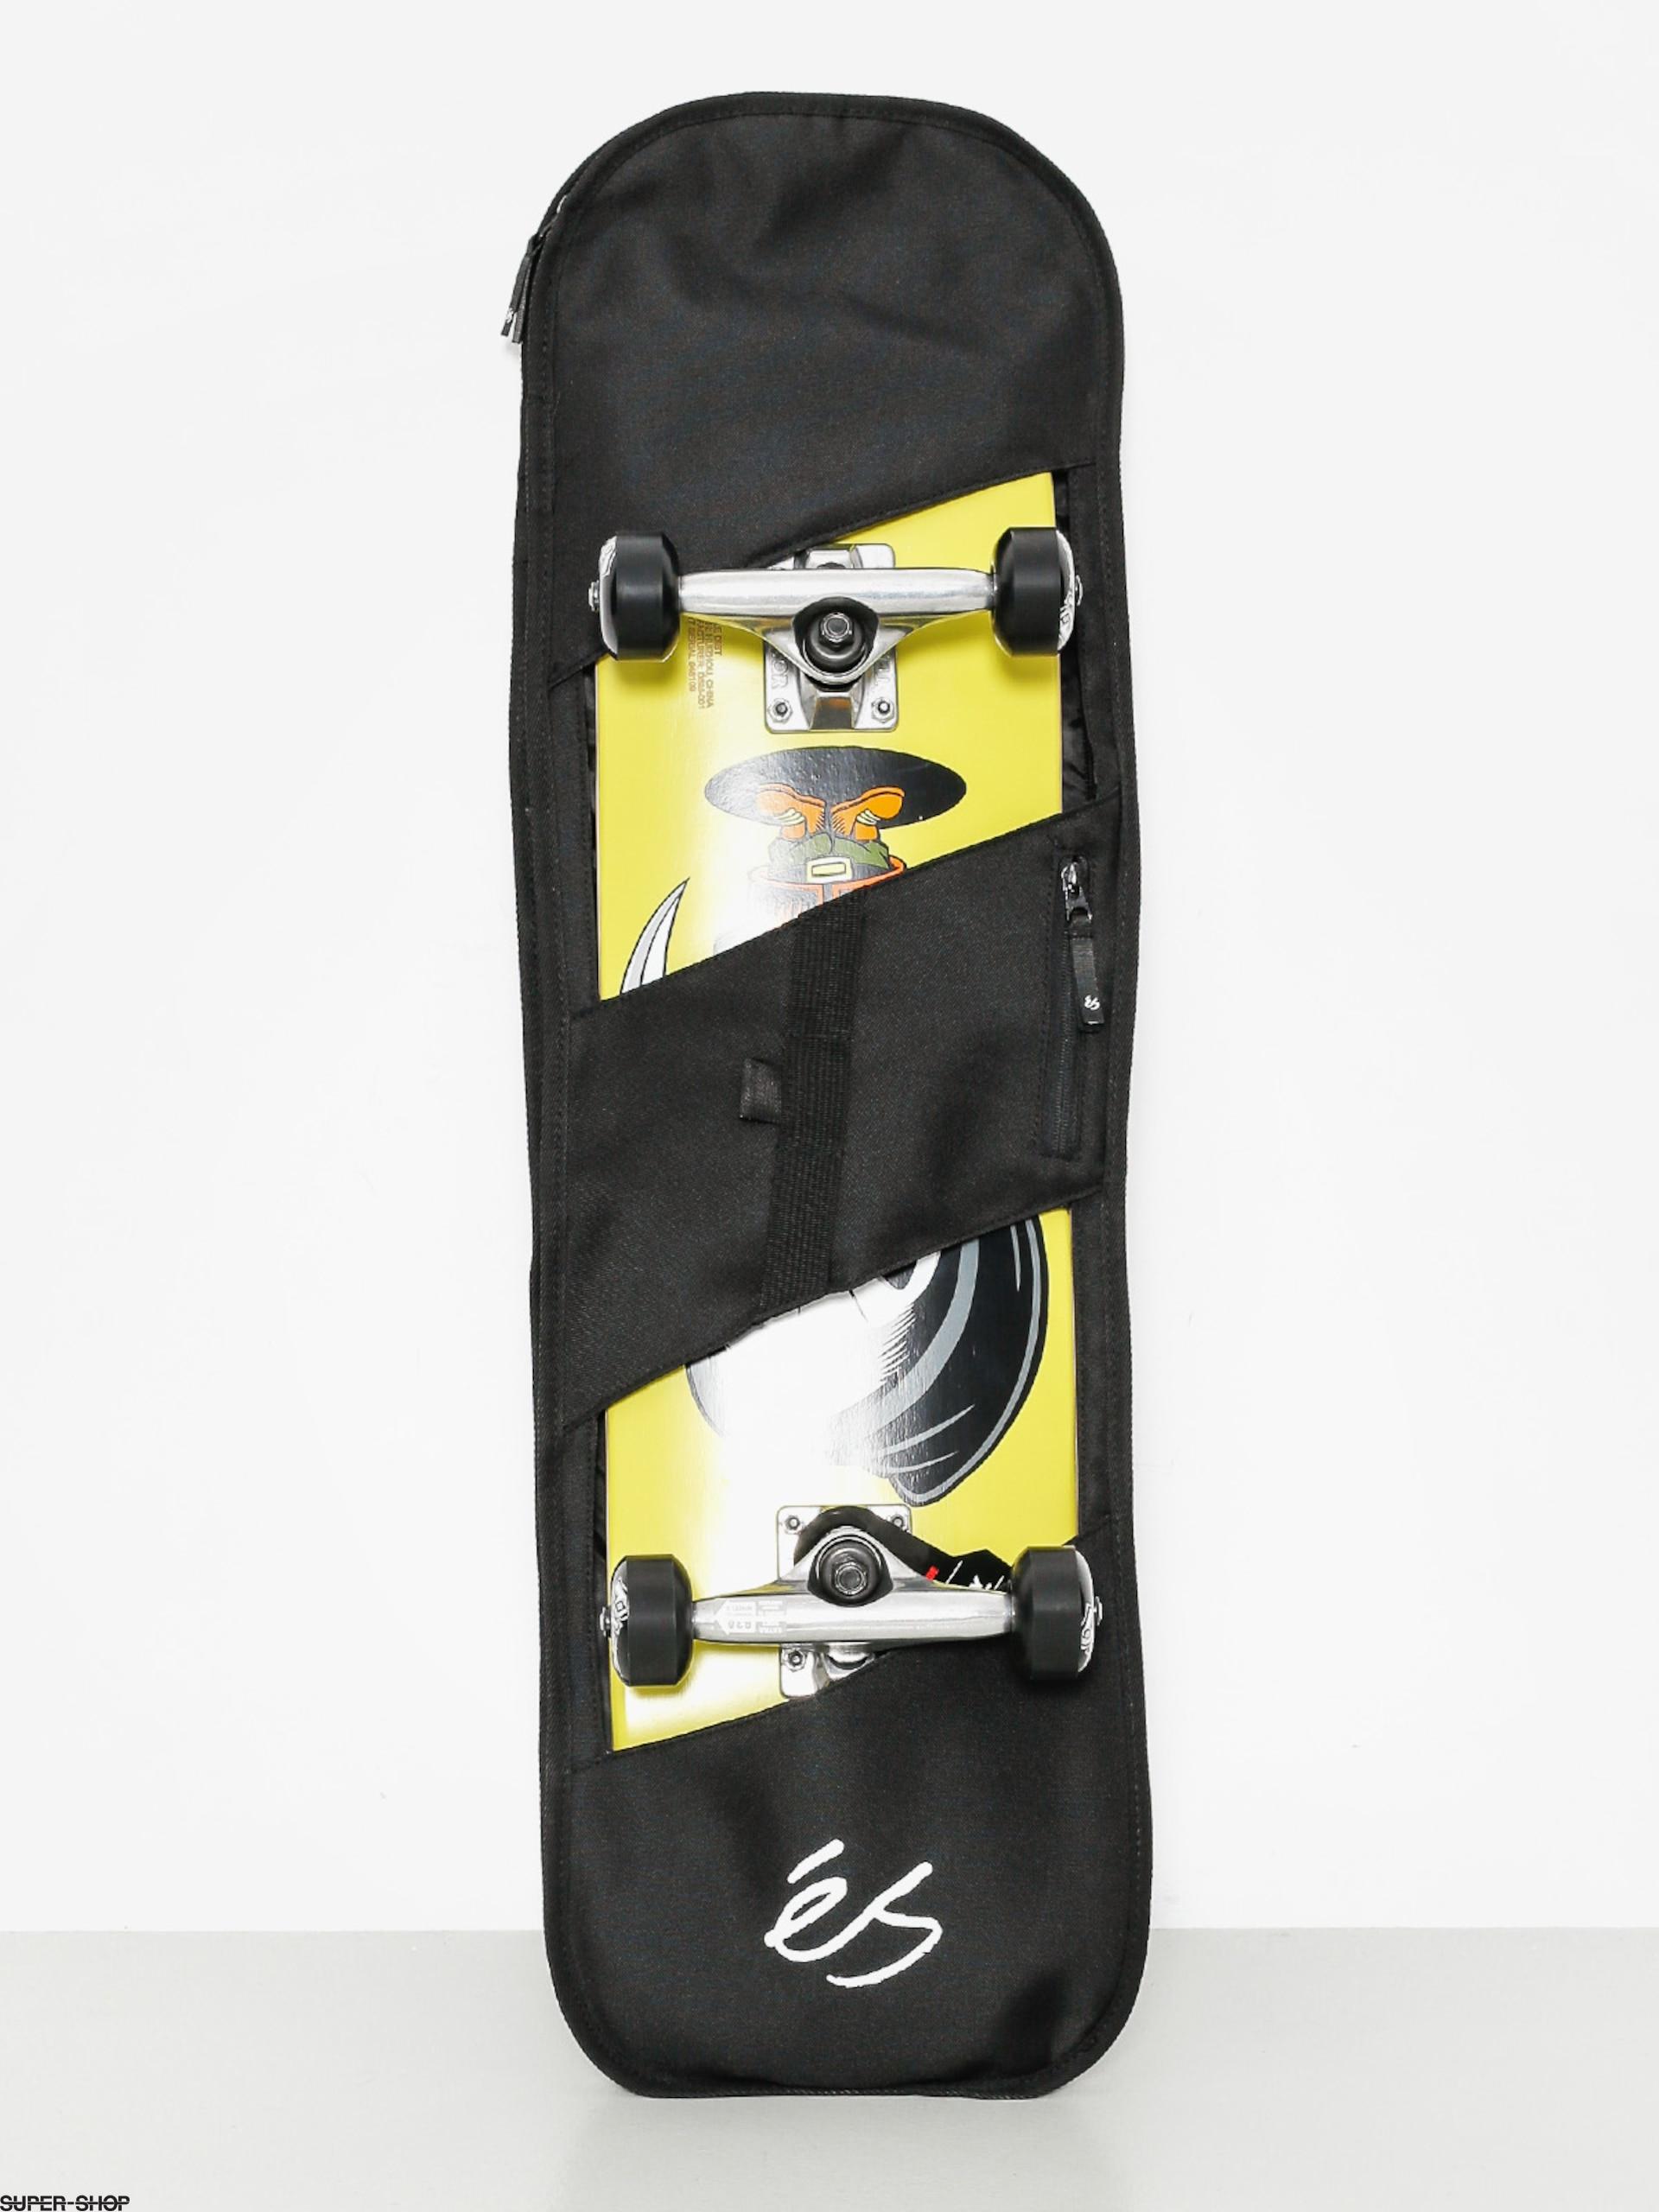 941188-w1920-es-skate-bag-black.jpg 343fef549ec1e